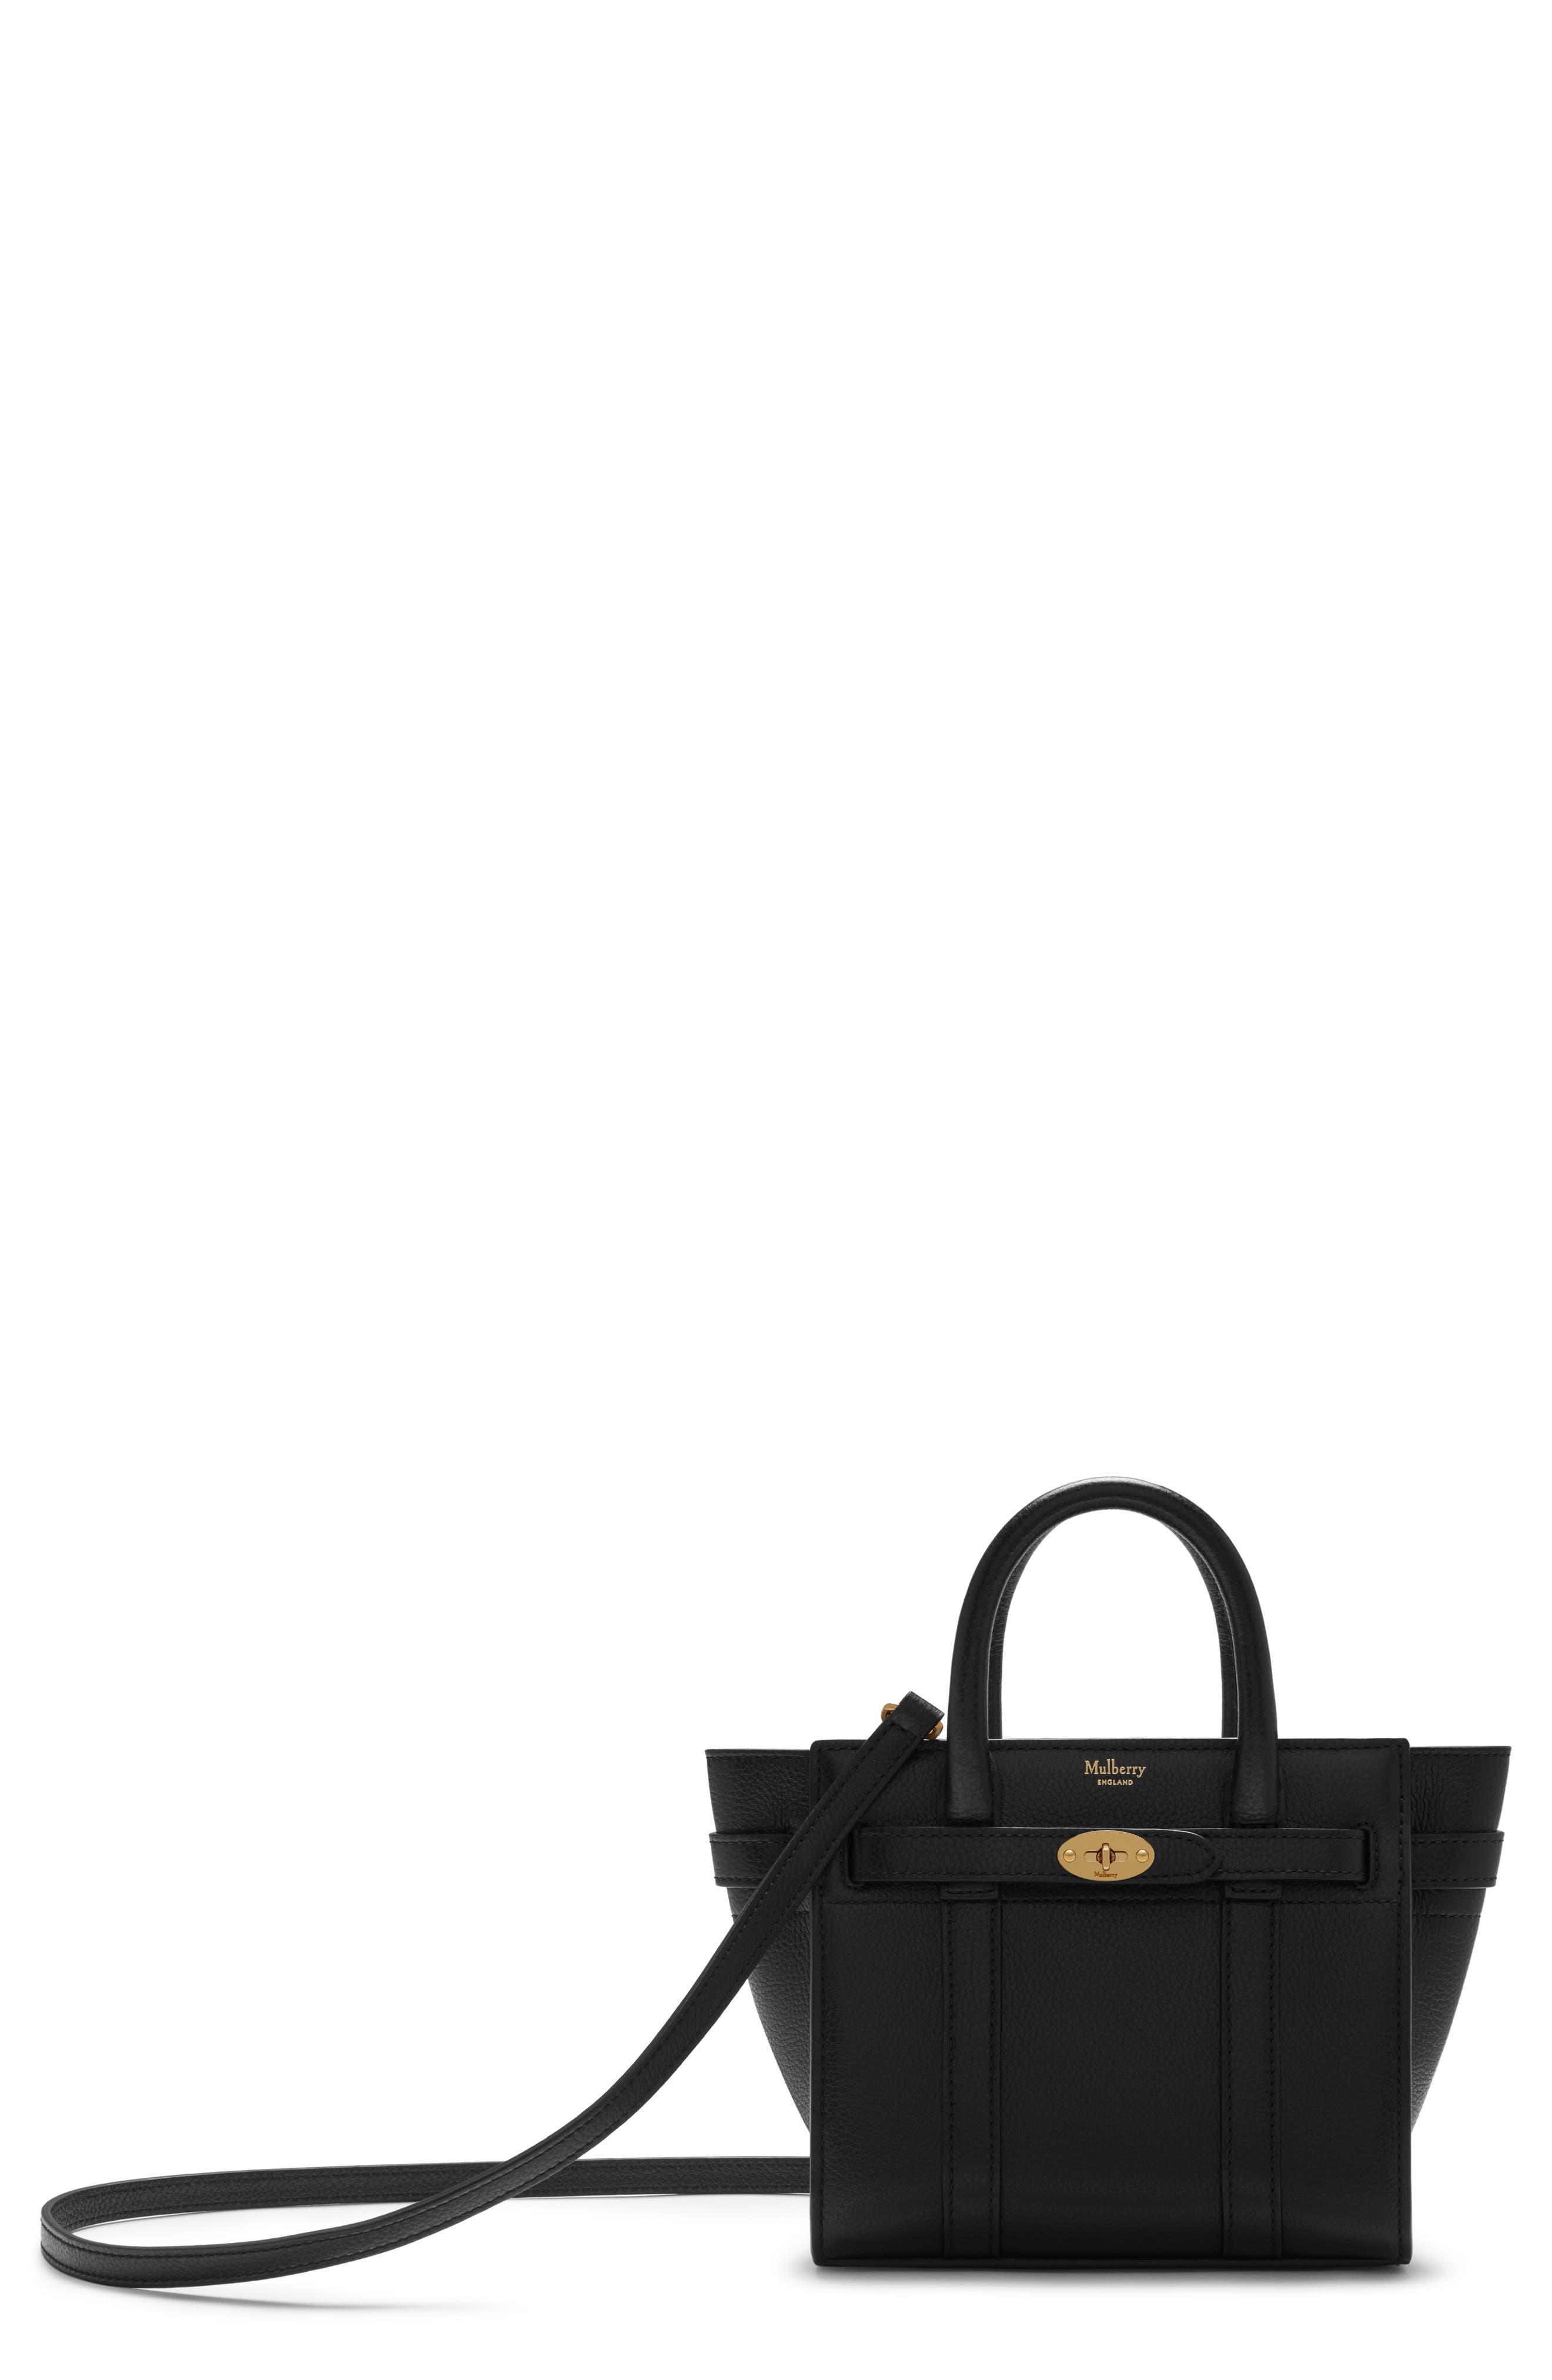 c23ba775e394 Mulberry Handbags   Wallets for Women